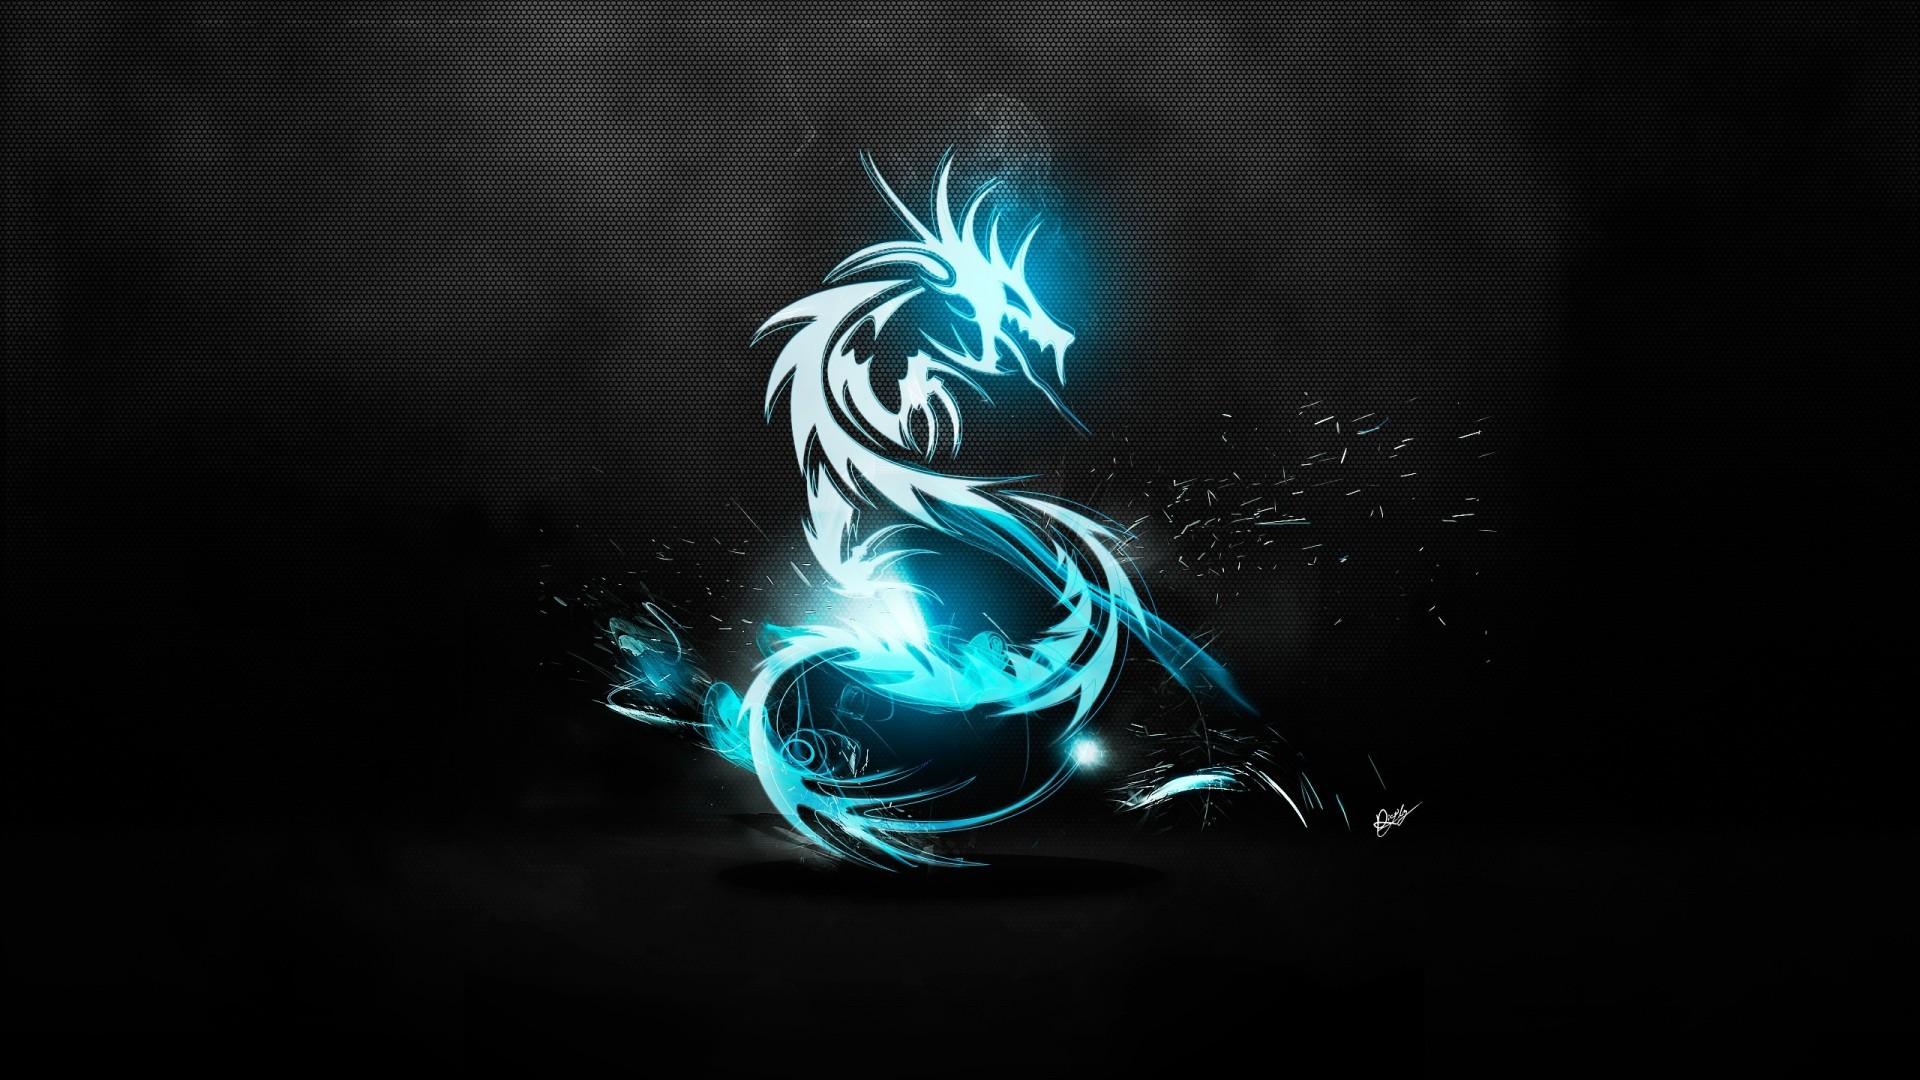 Blue Dragon HD Wallpapers 1 #BlueDragonHDWallpapers #BlueDragon  #hdwallpapers #wallpapers